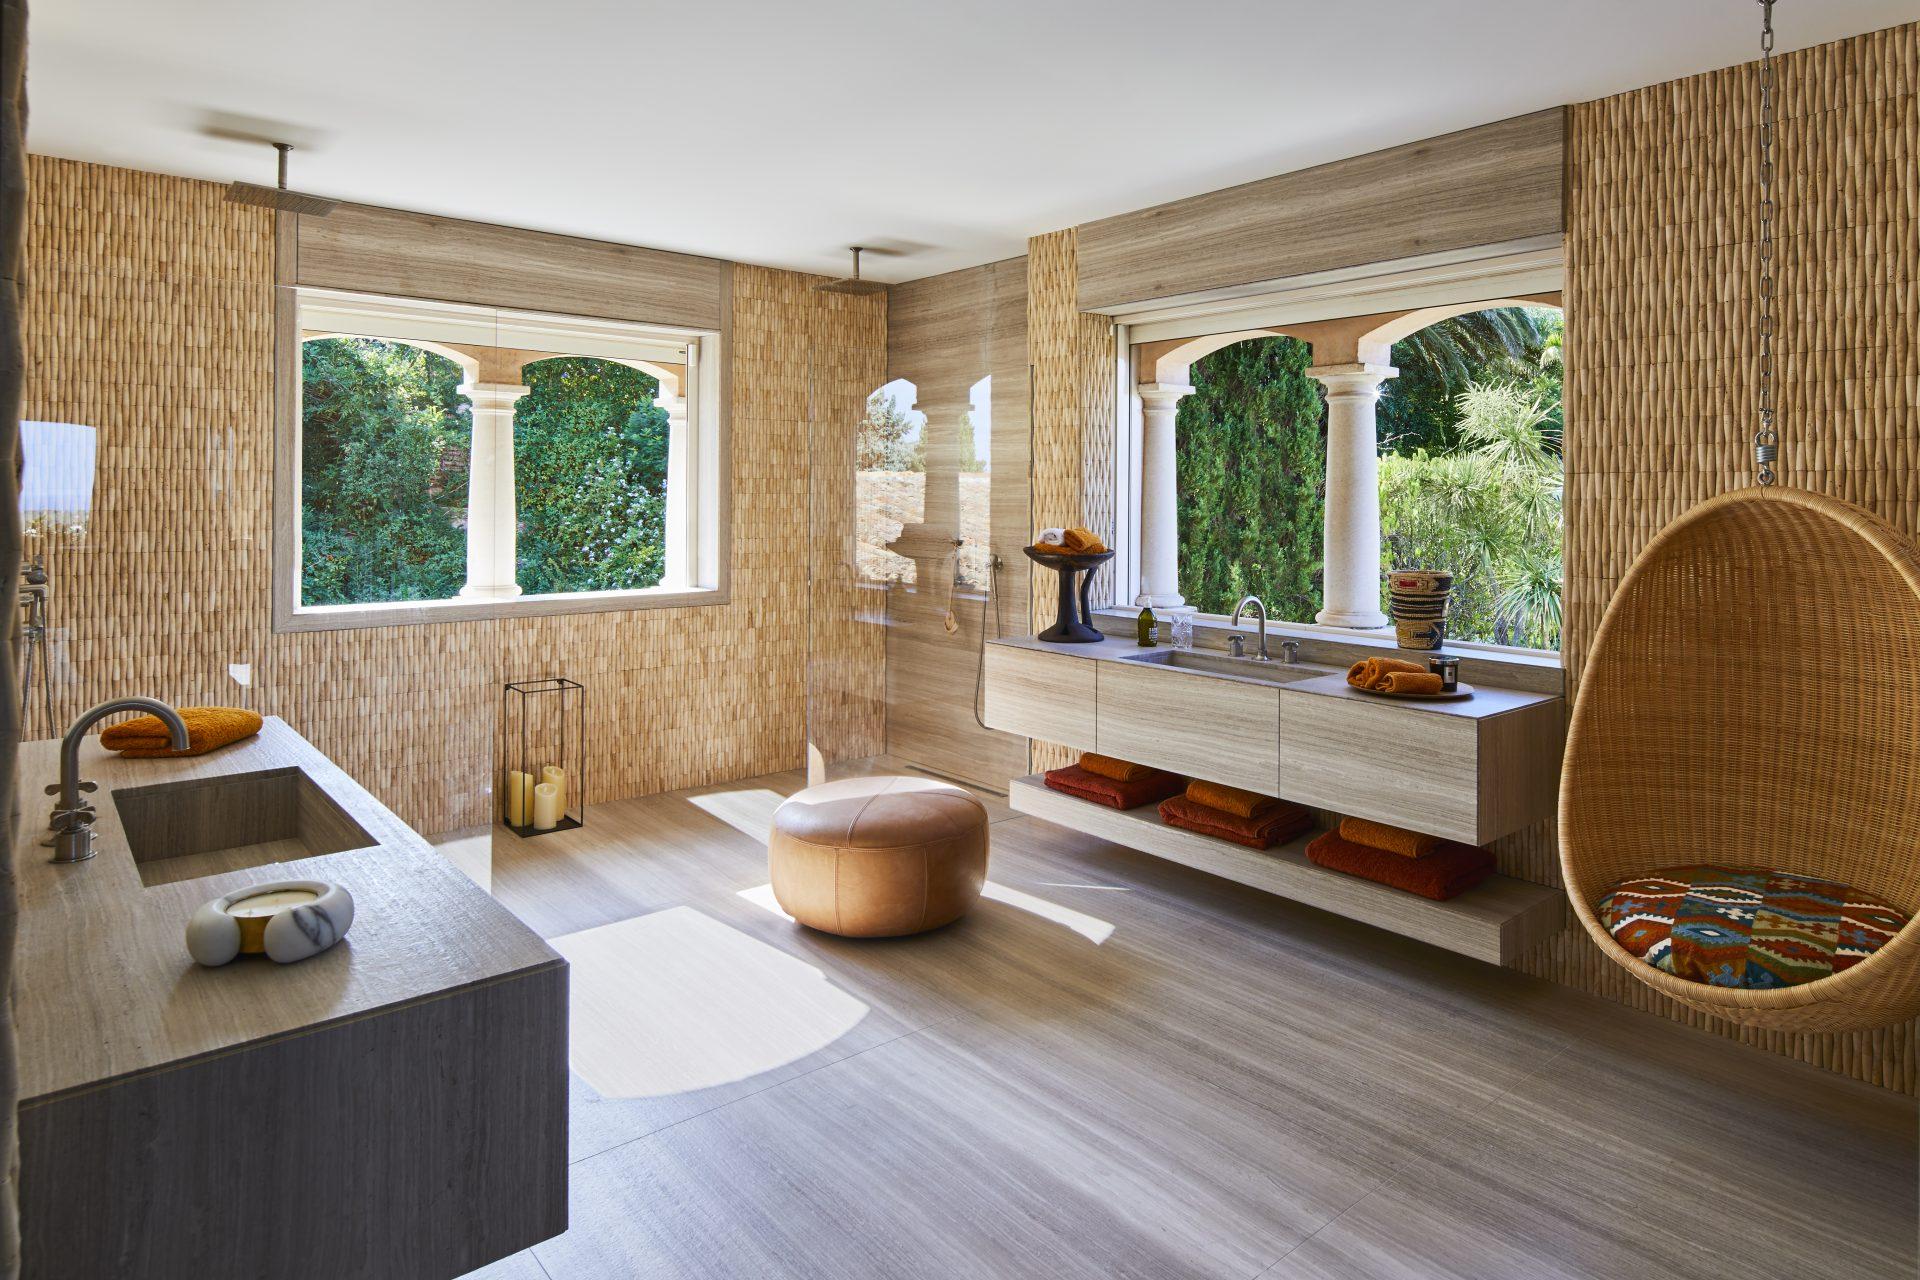 SC Saint Tropez salle de bain travertin bambou